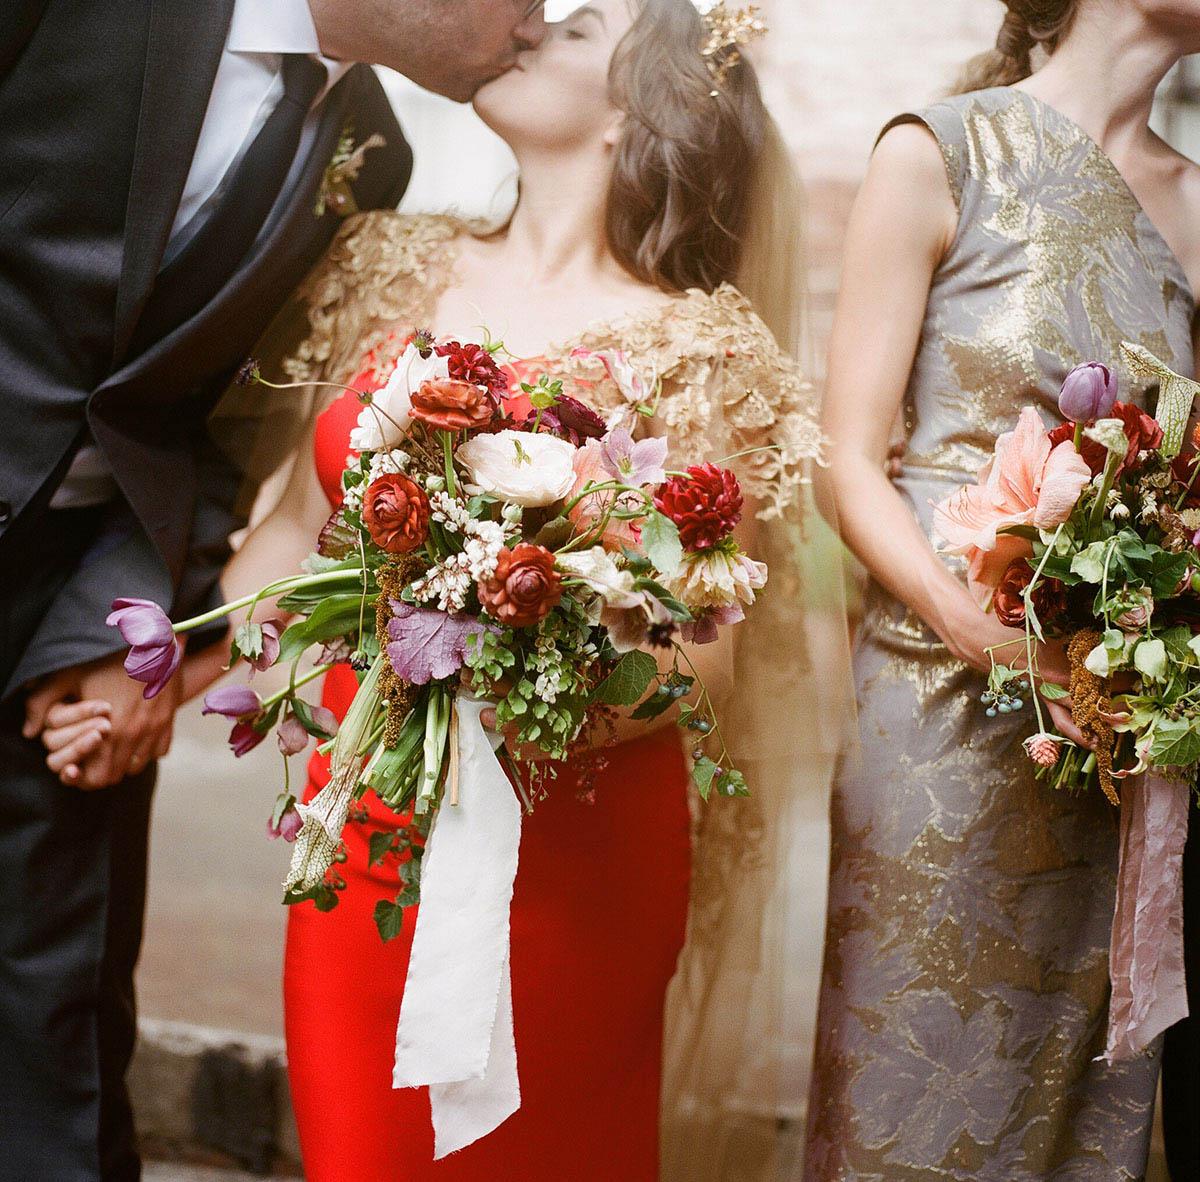 21-red-wedding-dress.jpg